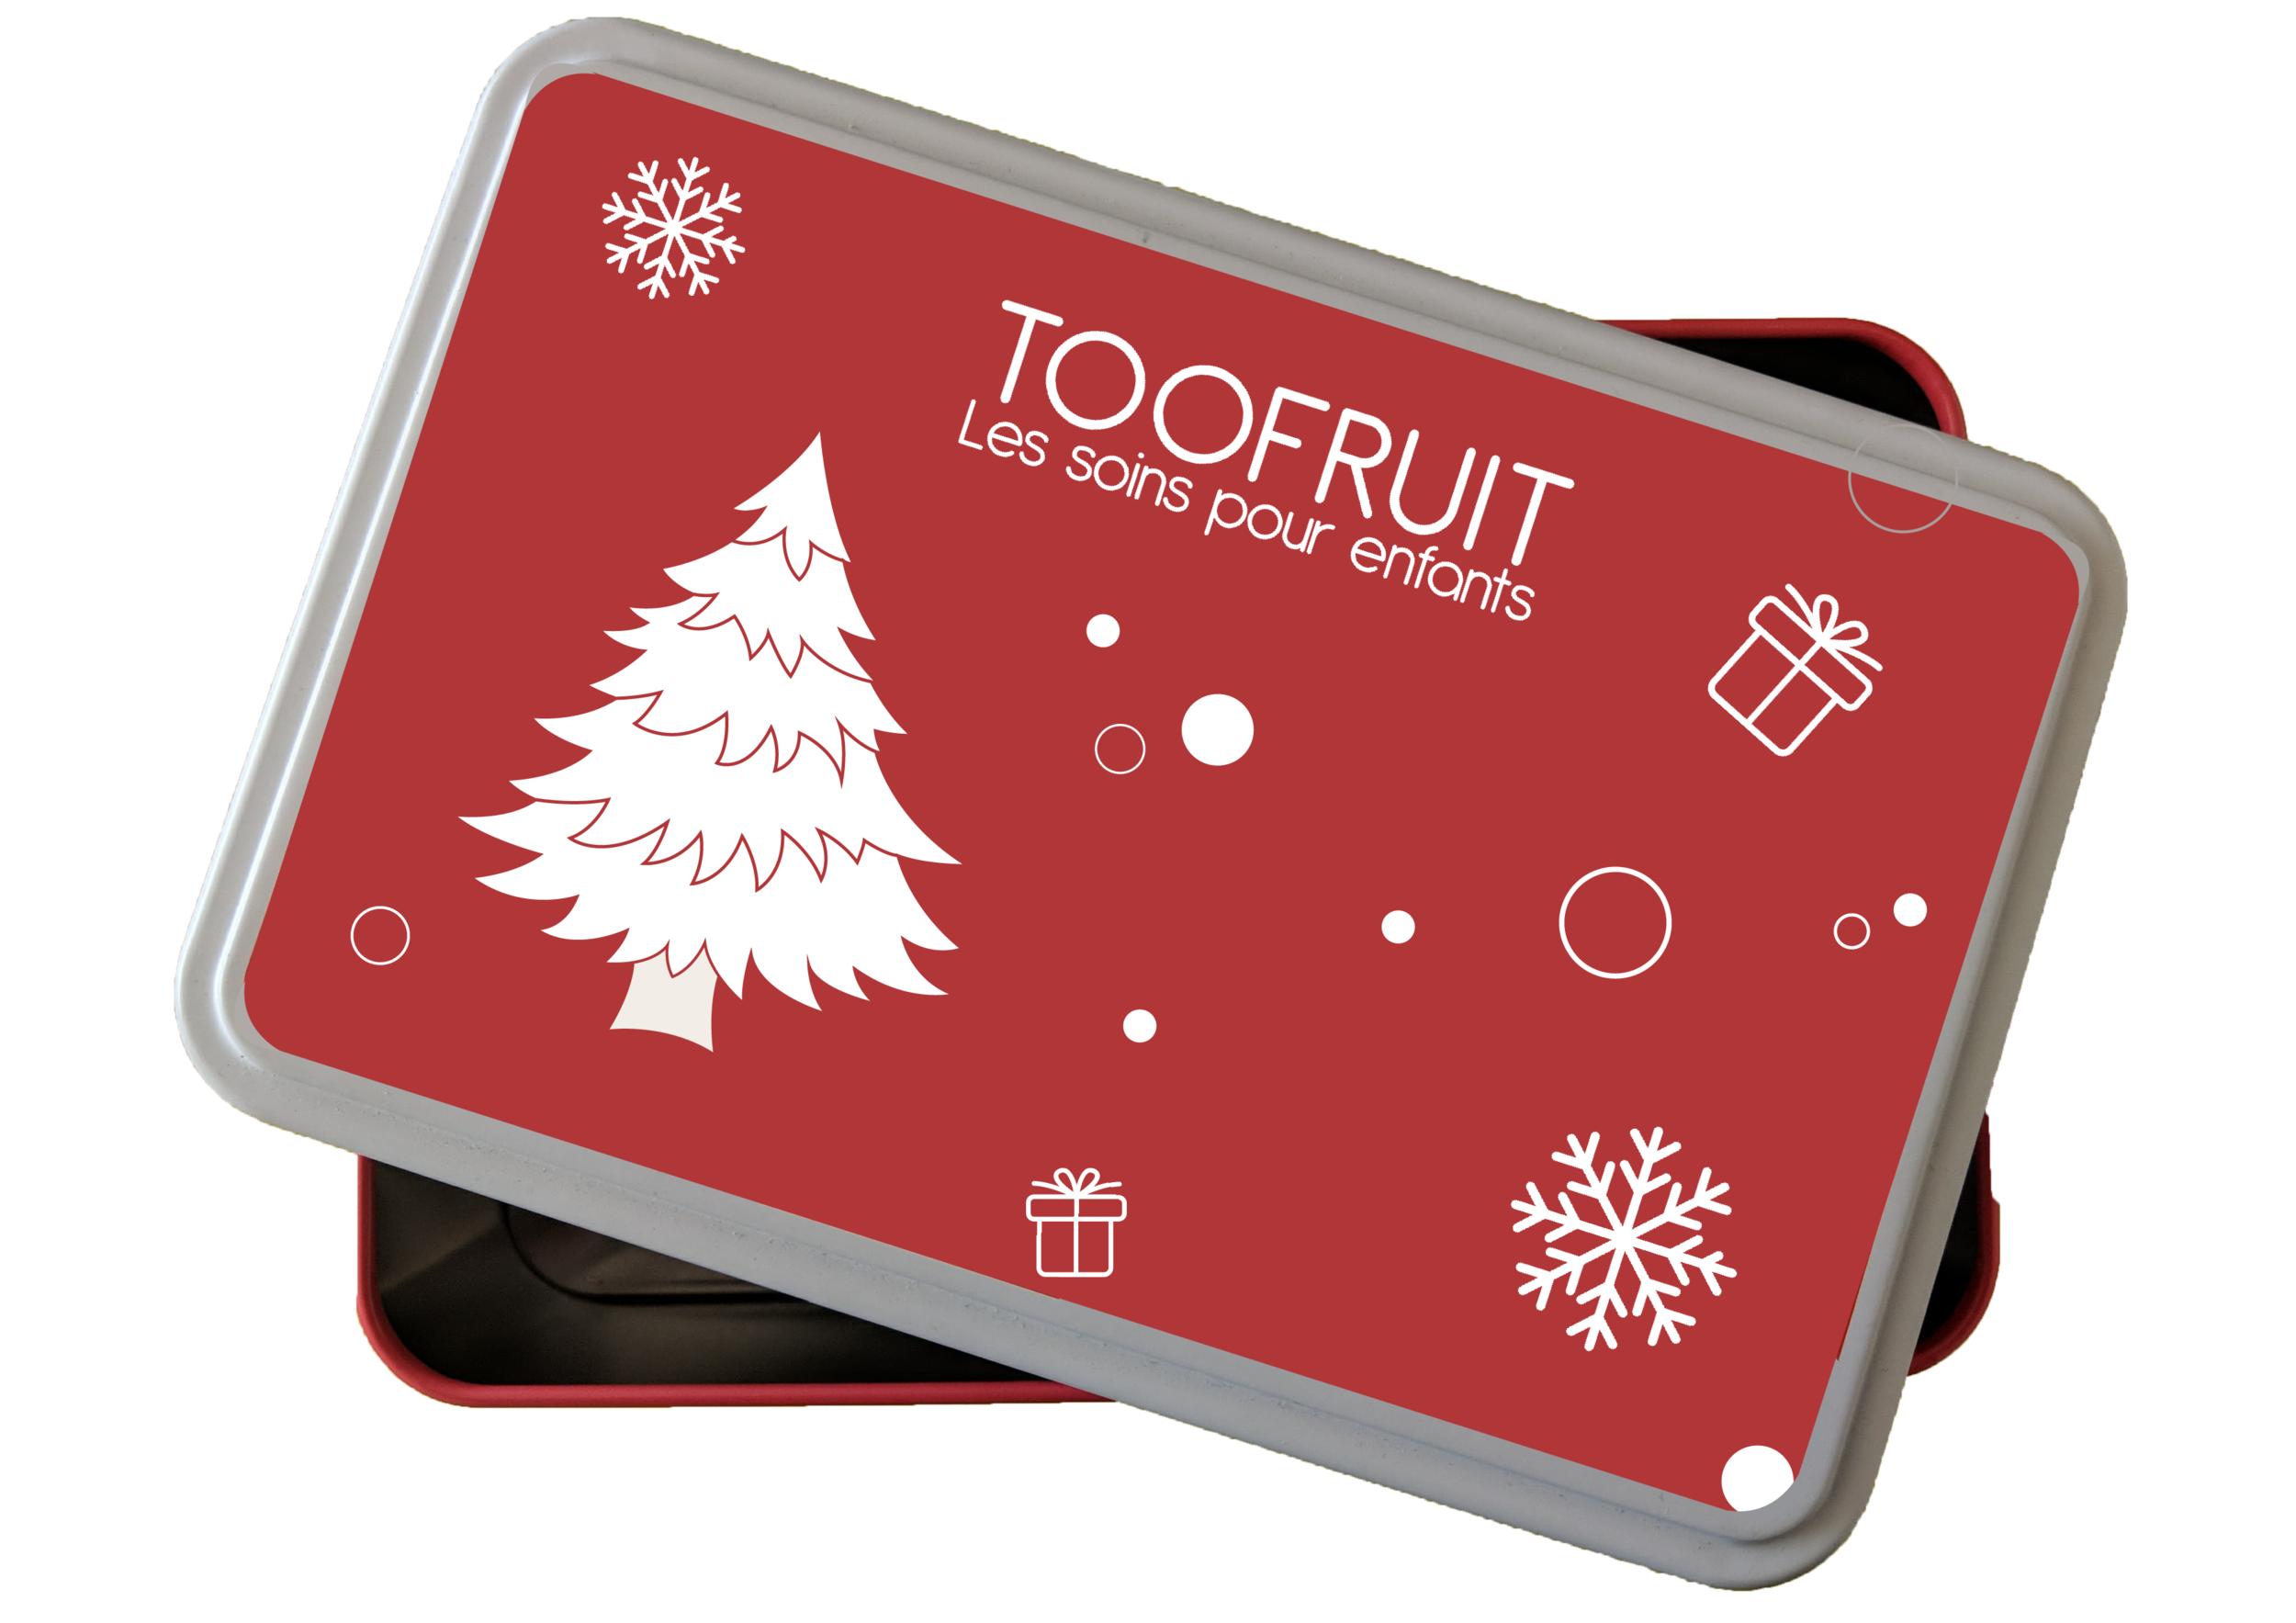 BOITE CADEAU NOÊL toofruit